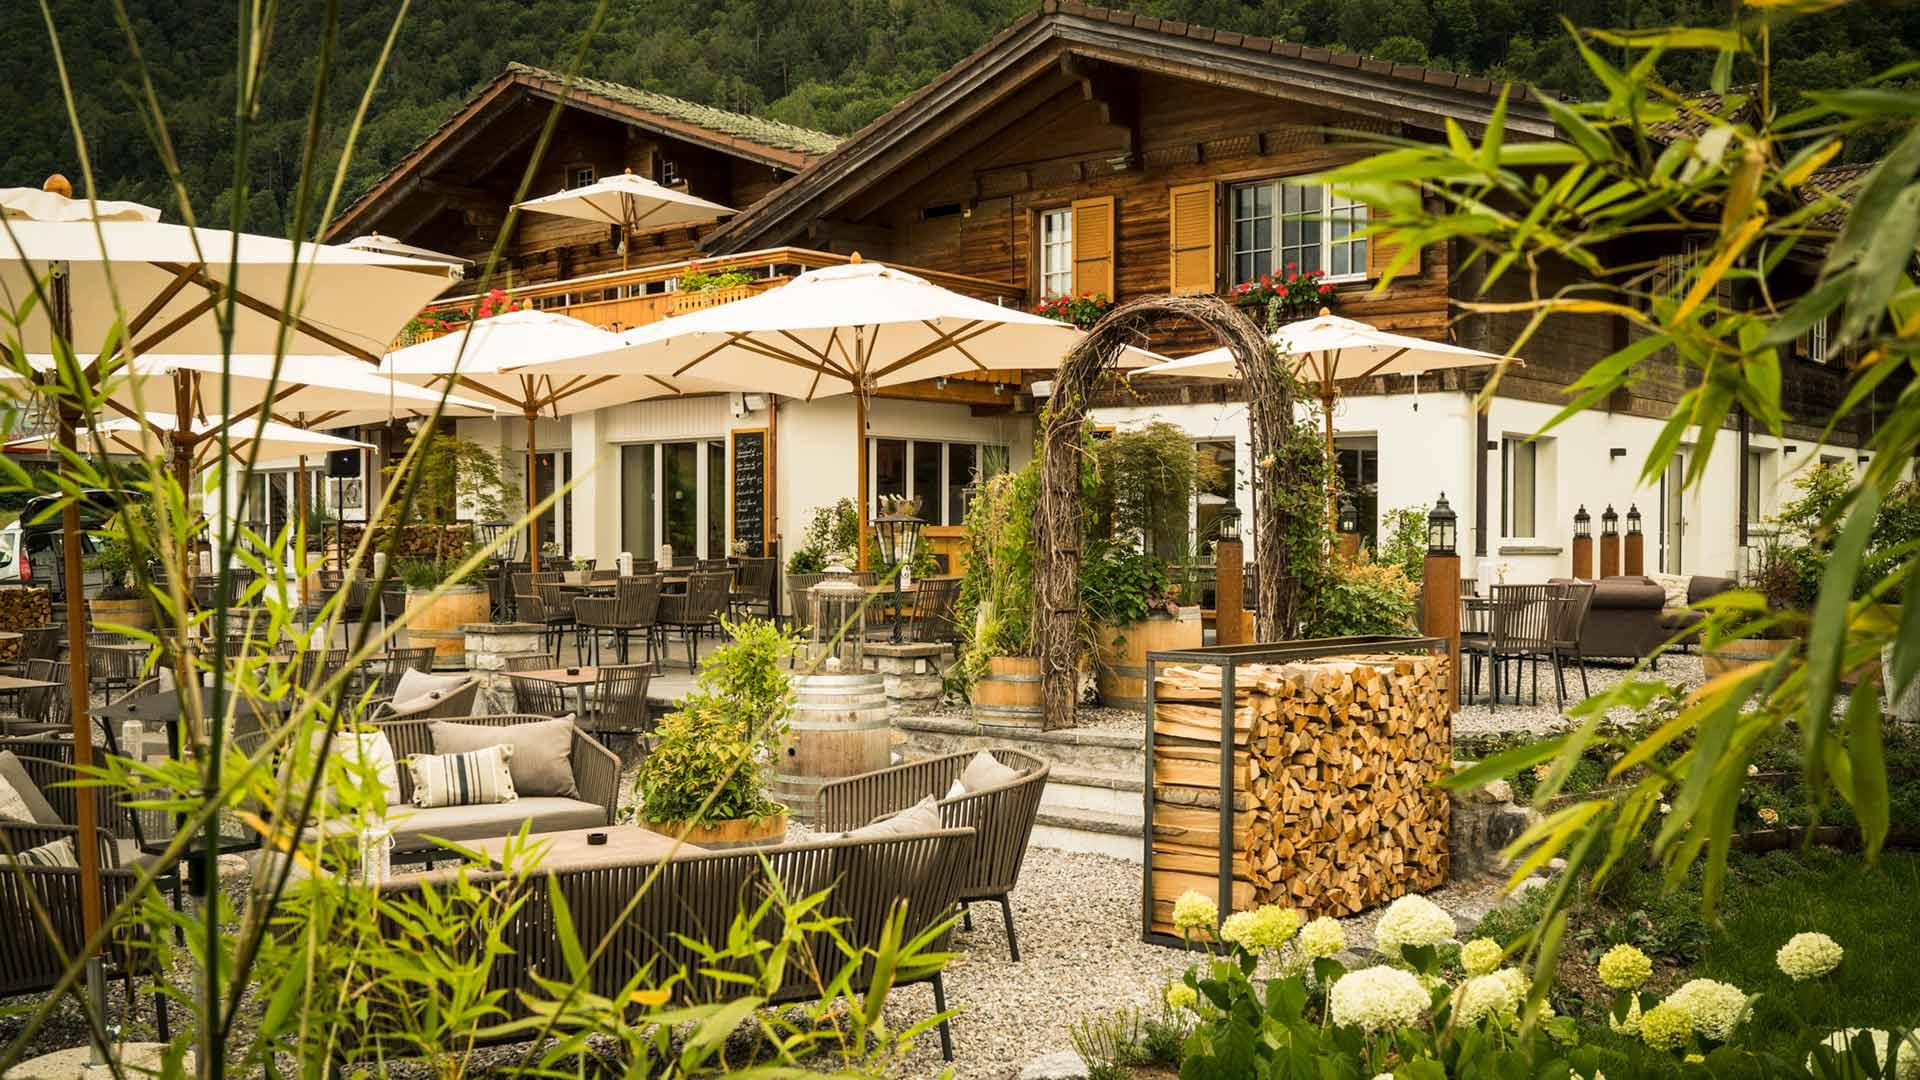 hotel-restaurant-burgseeli-terrasse-schirme-ambiente